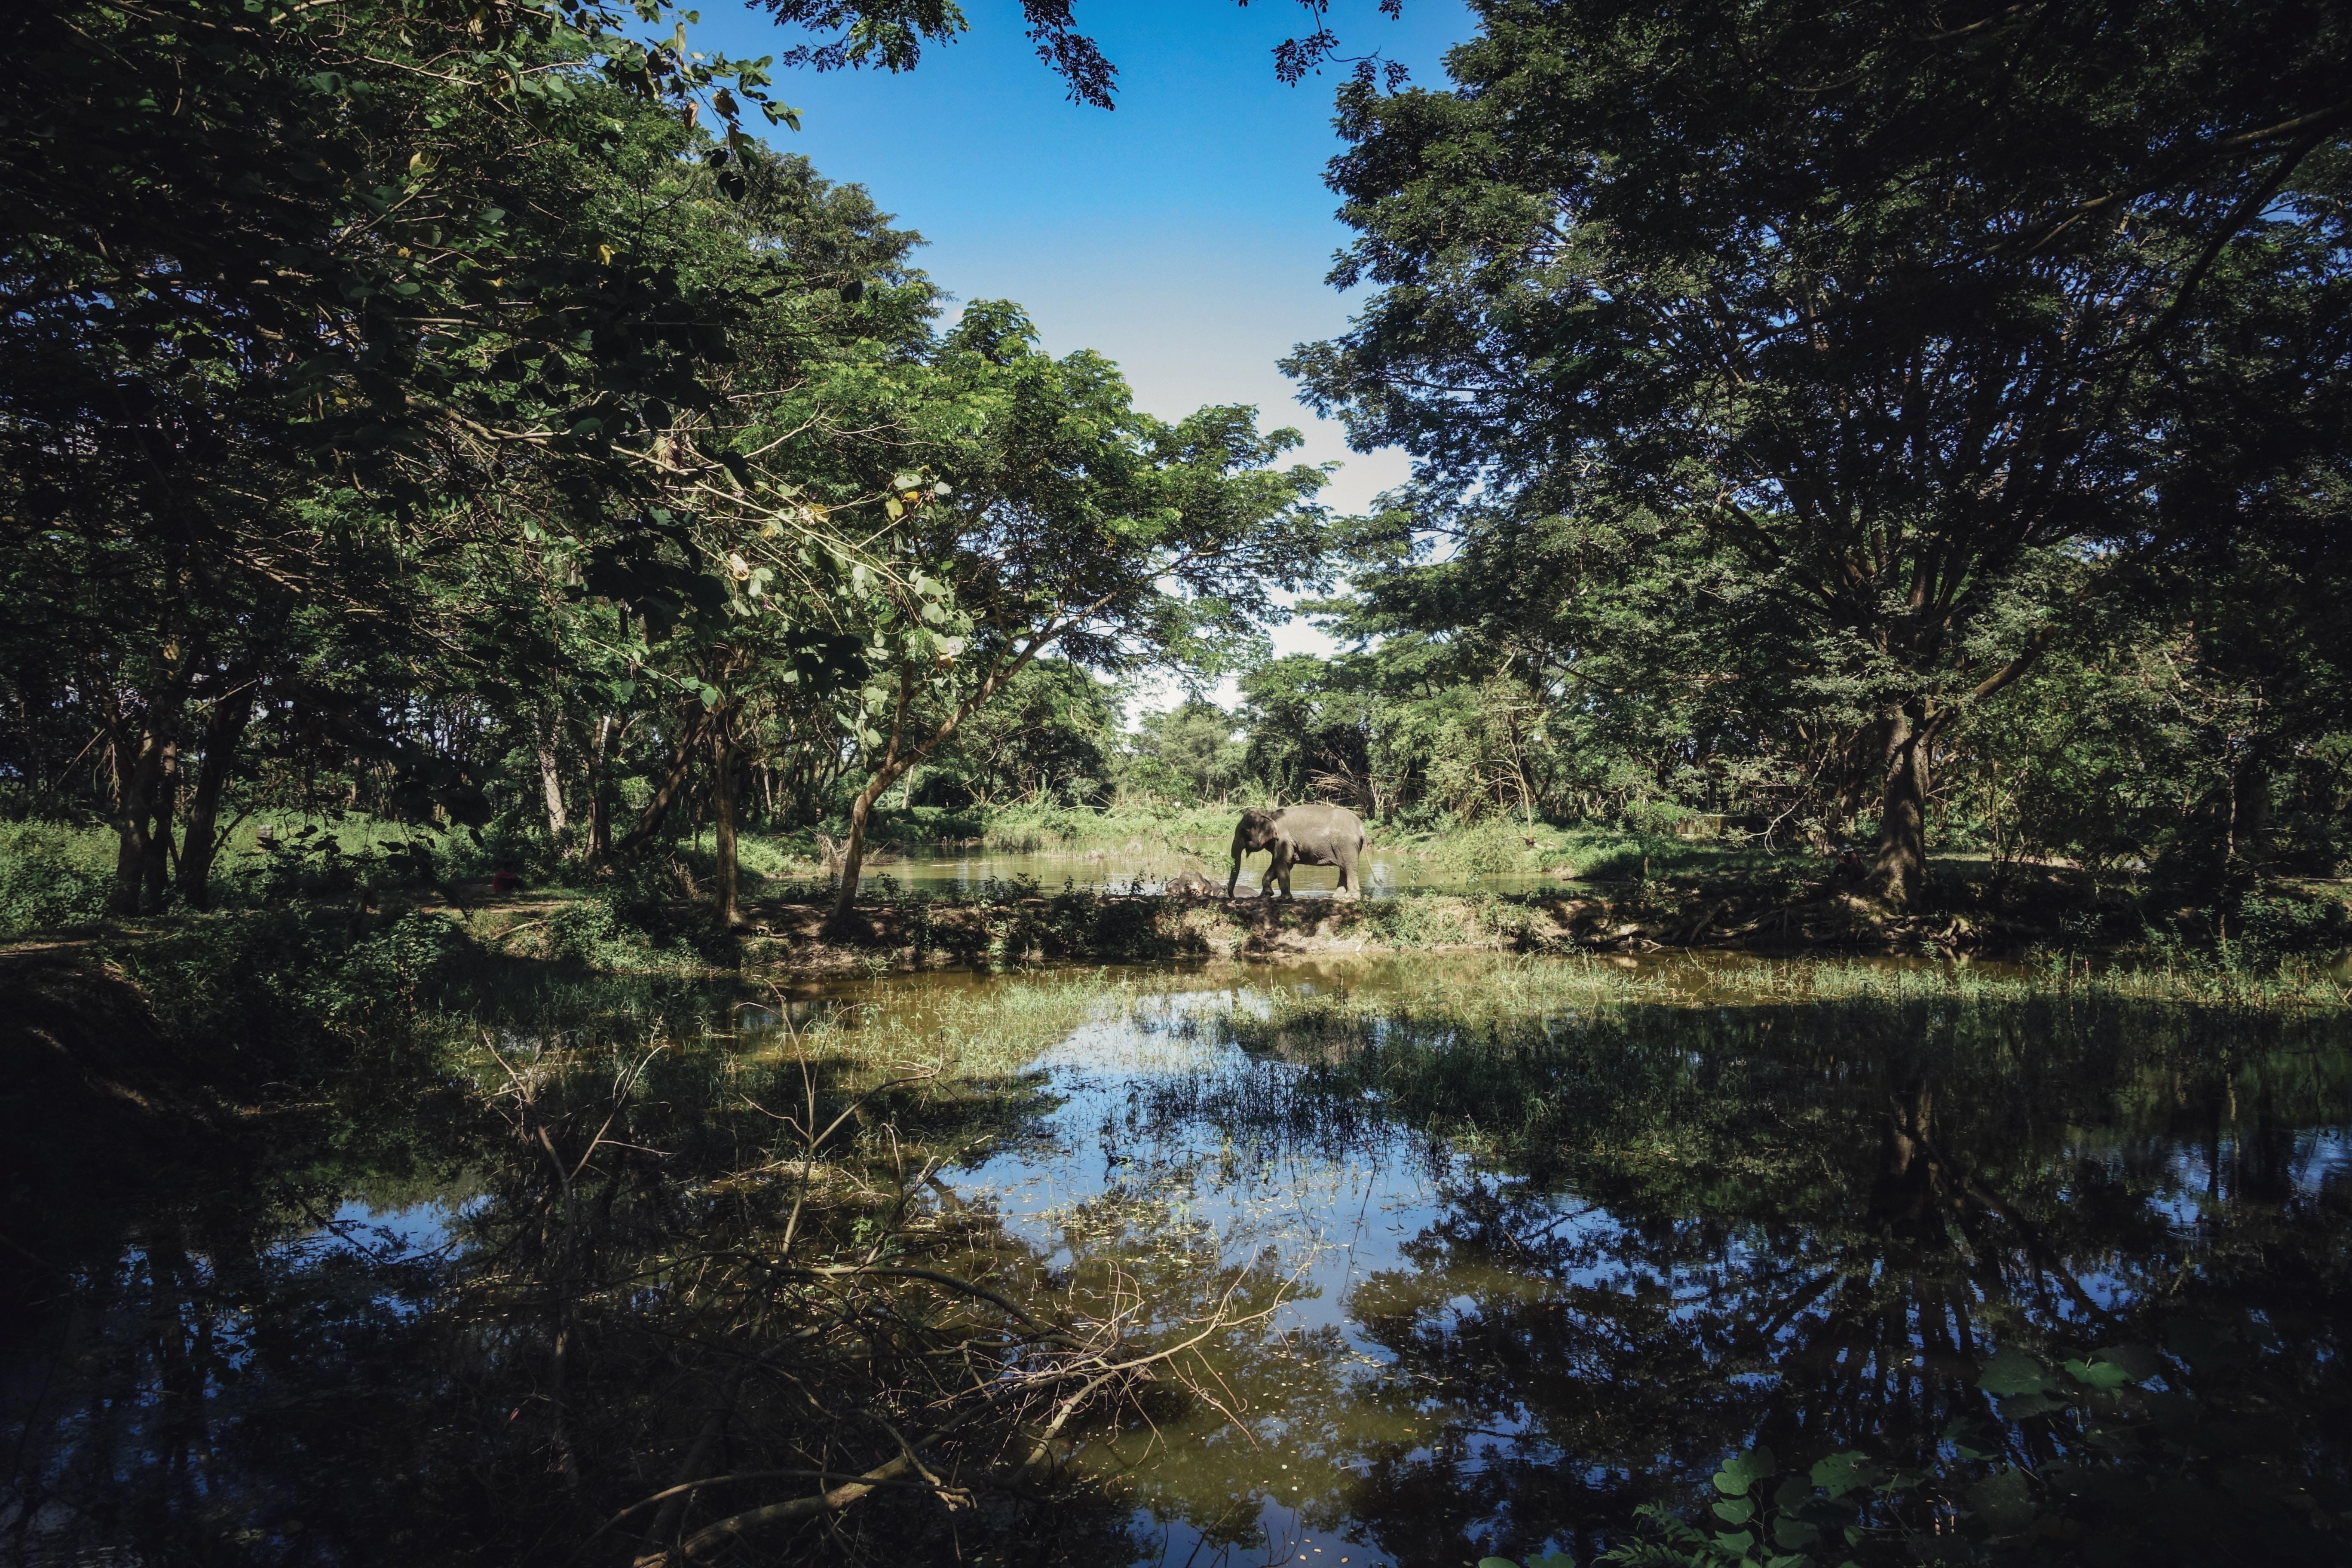 gray elephant near lake between trees at daytime